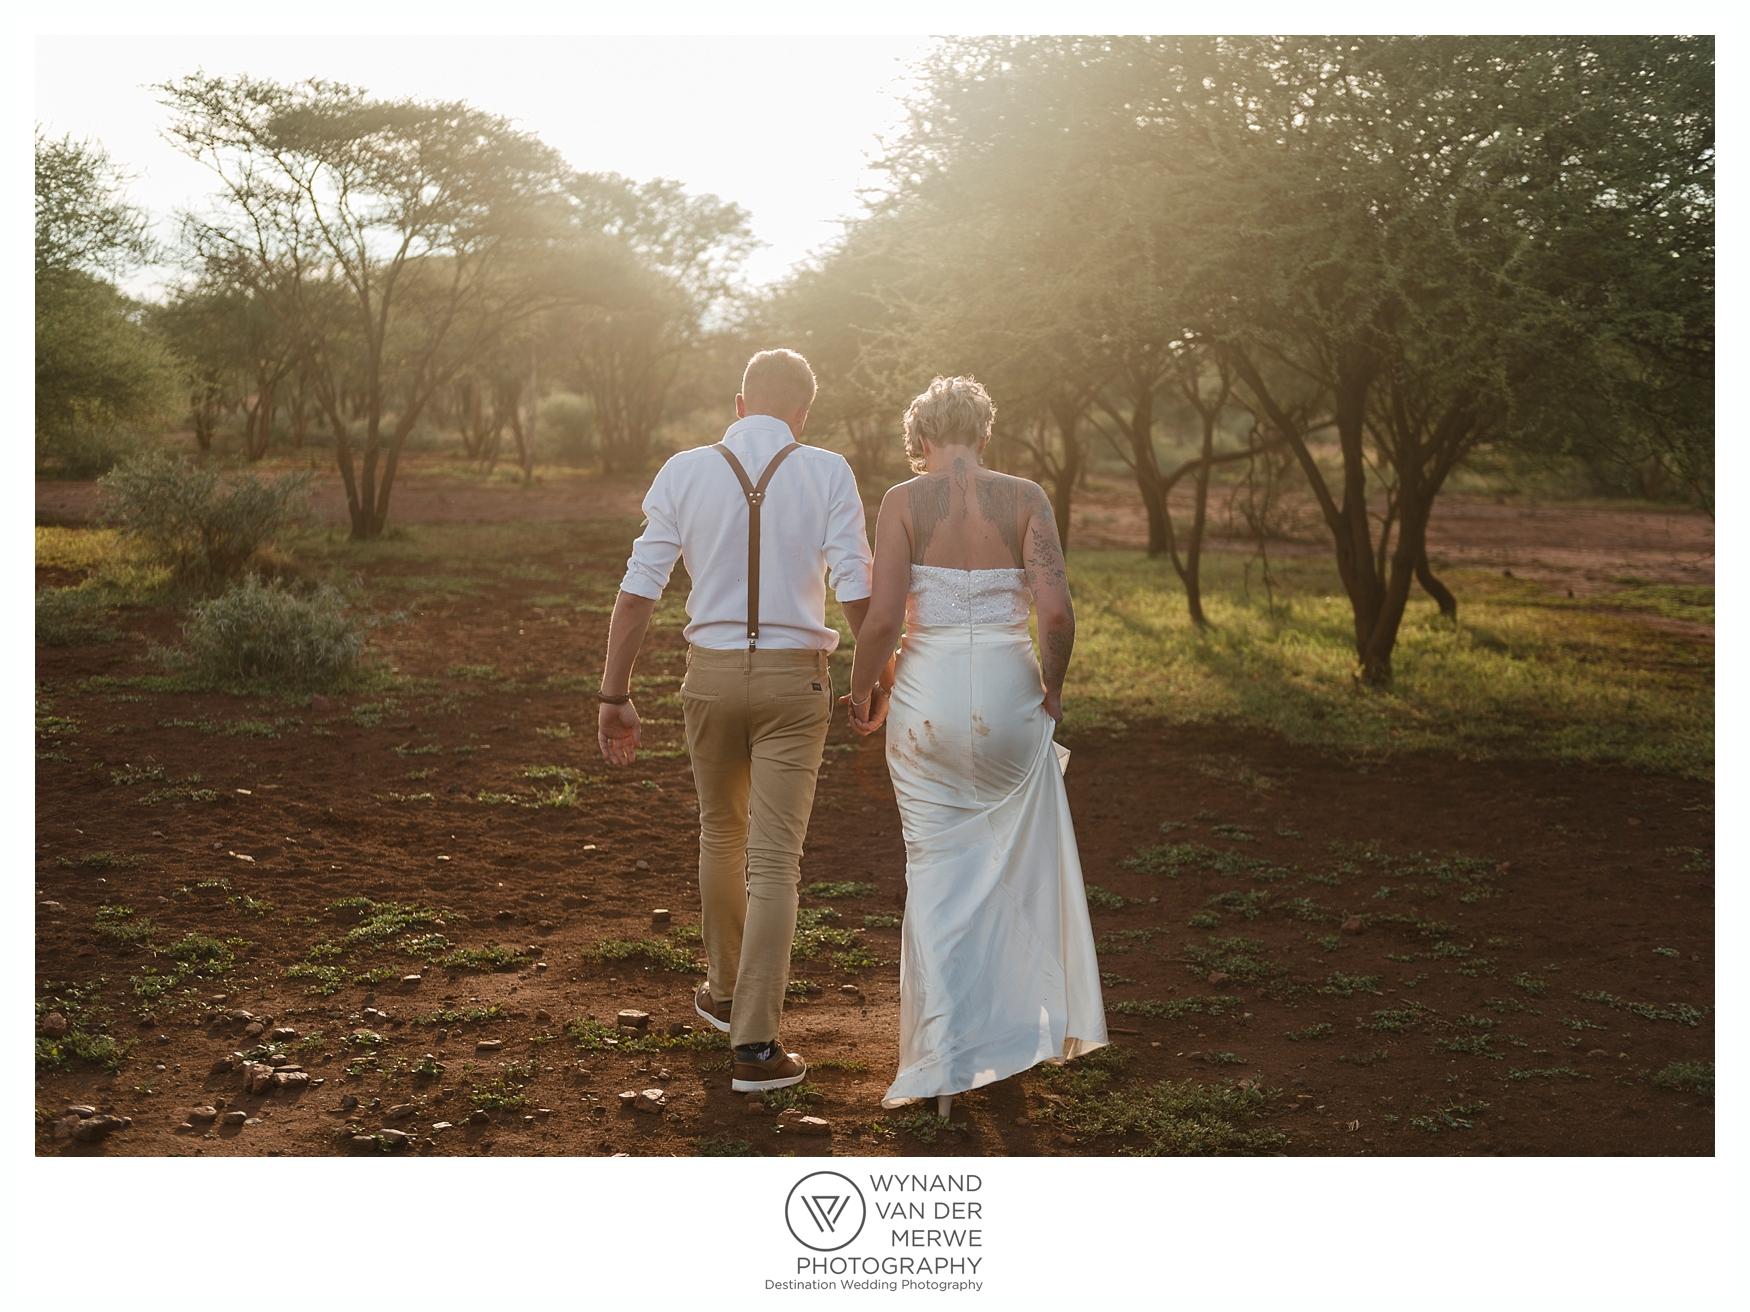 WynandvanderMerwe_weddingphotography_bushveldwedding_northam_bushveld_limpopowedding_limpopo_southafrica-227.jpg